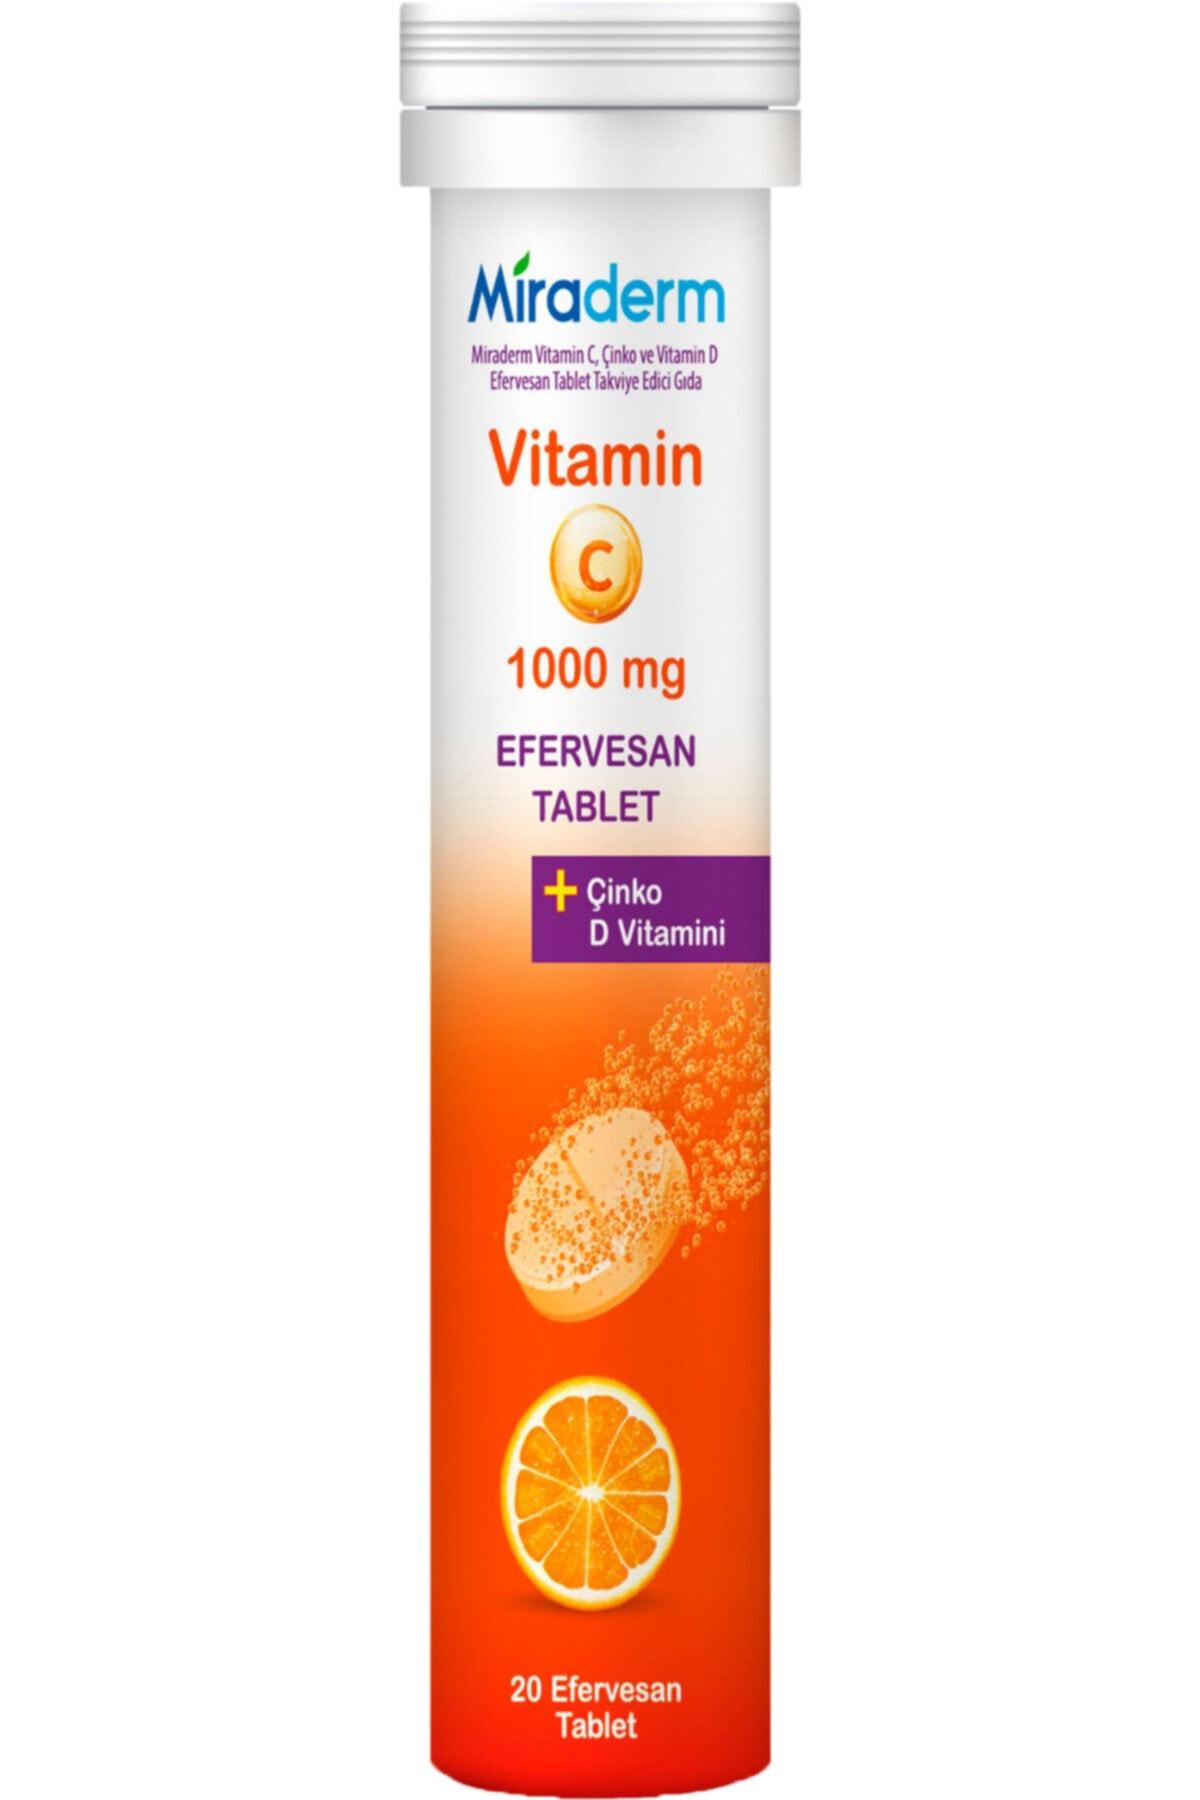 Miraderm C Vitamini 3 Lü Etki 1000 Mg 20 Efervesan 1